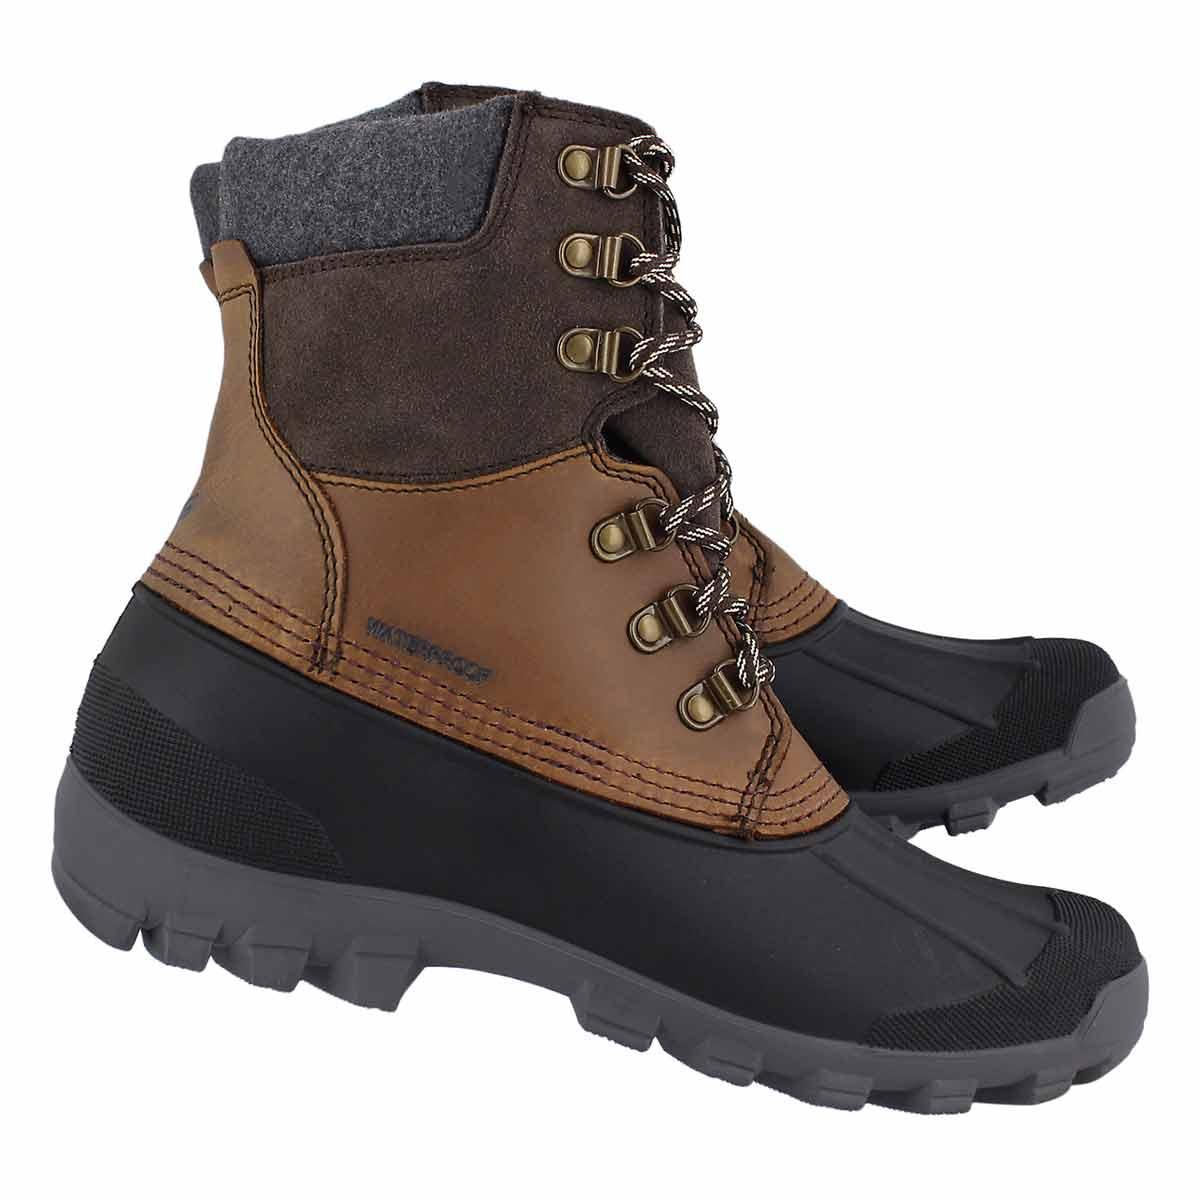 Mns Hudson5 dark brown wtrpf winter boot